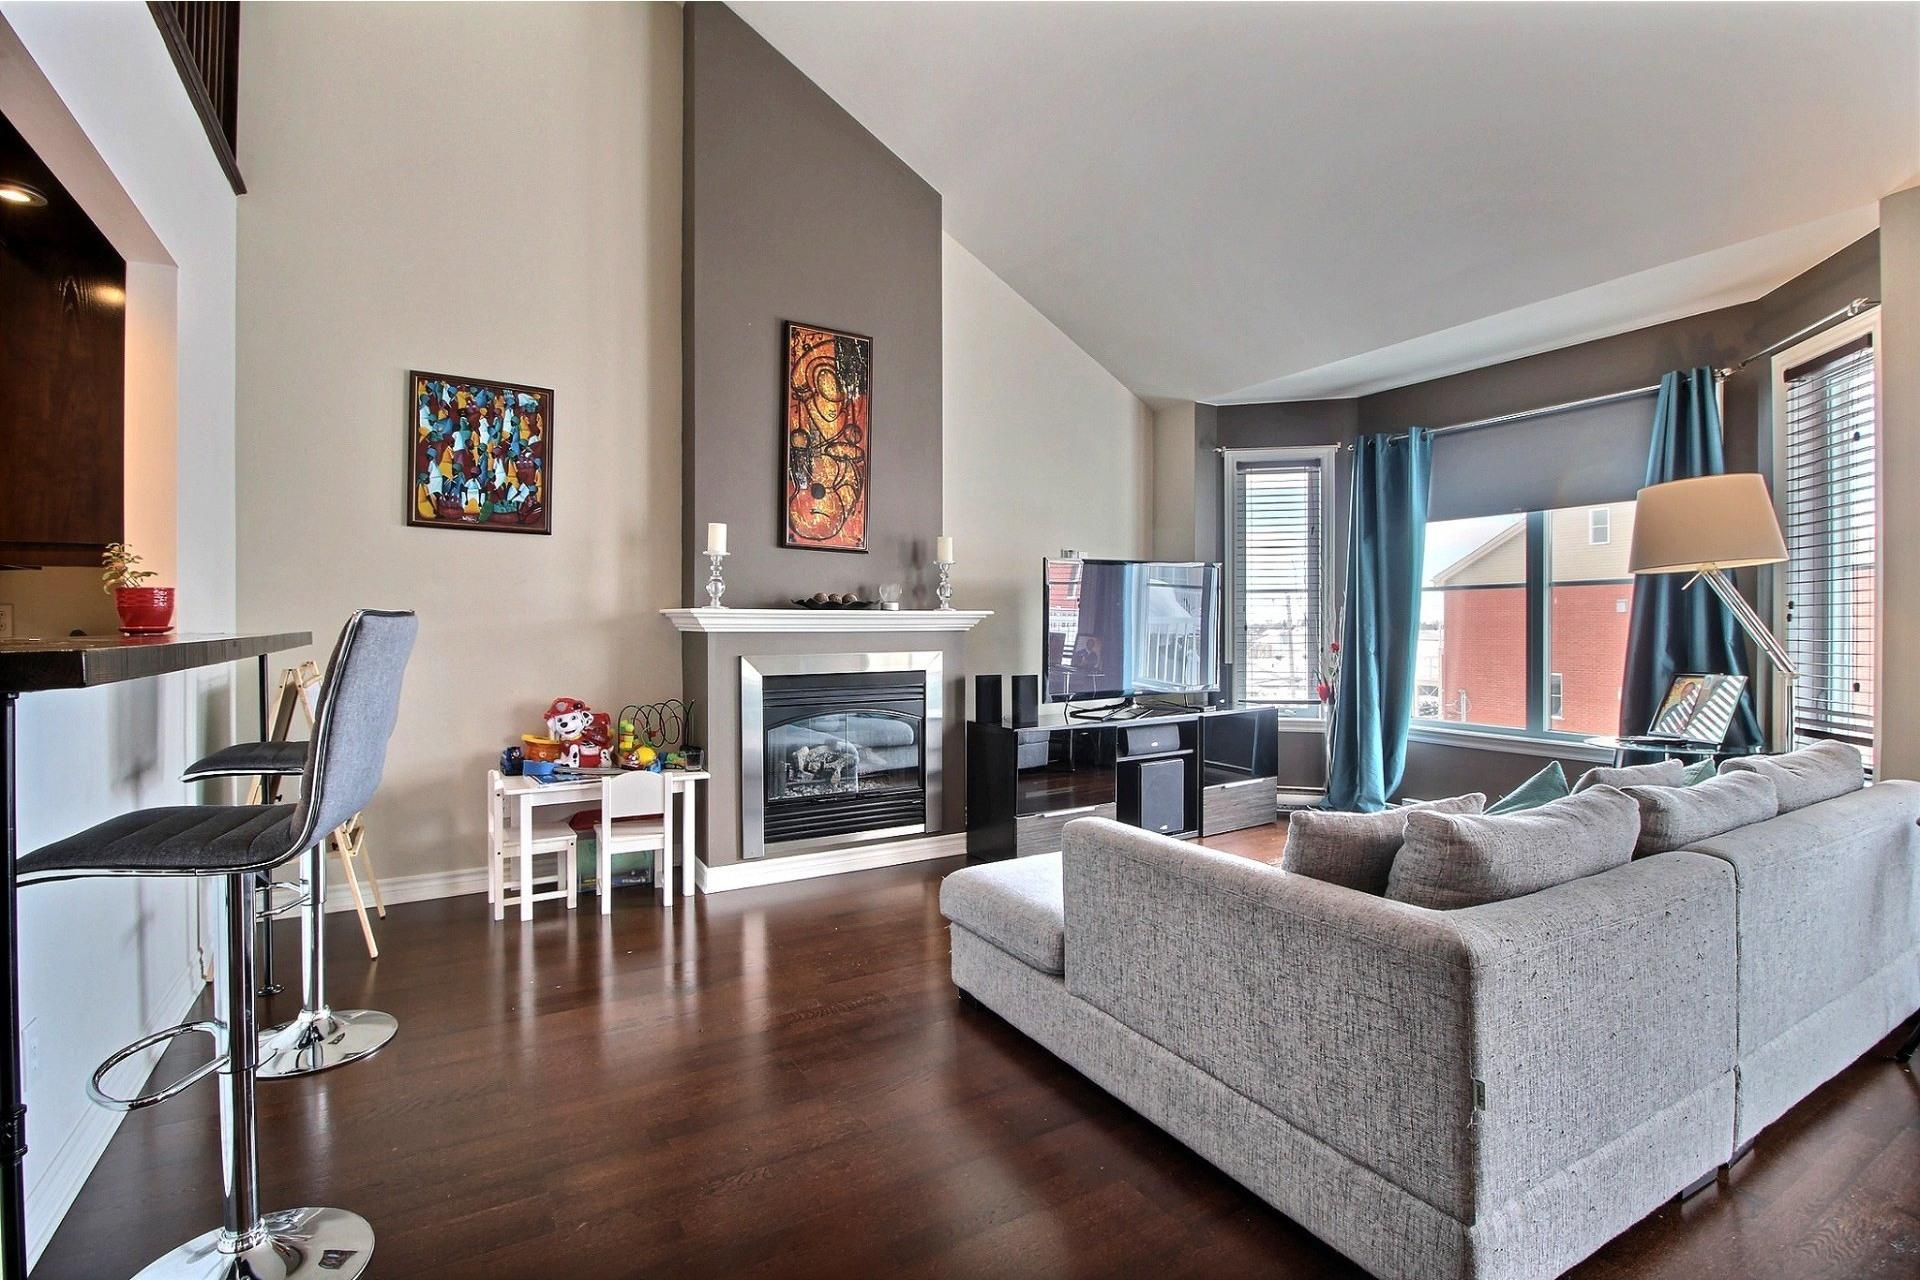 image 6 - Apartment For sale Longueuil Saint-Hubert  - 6 rooms